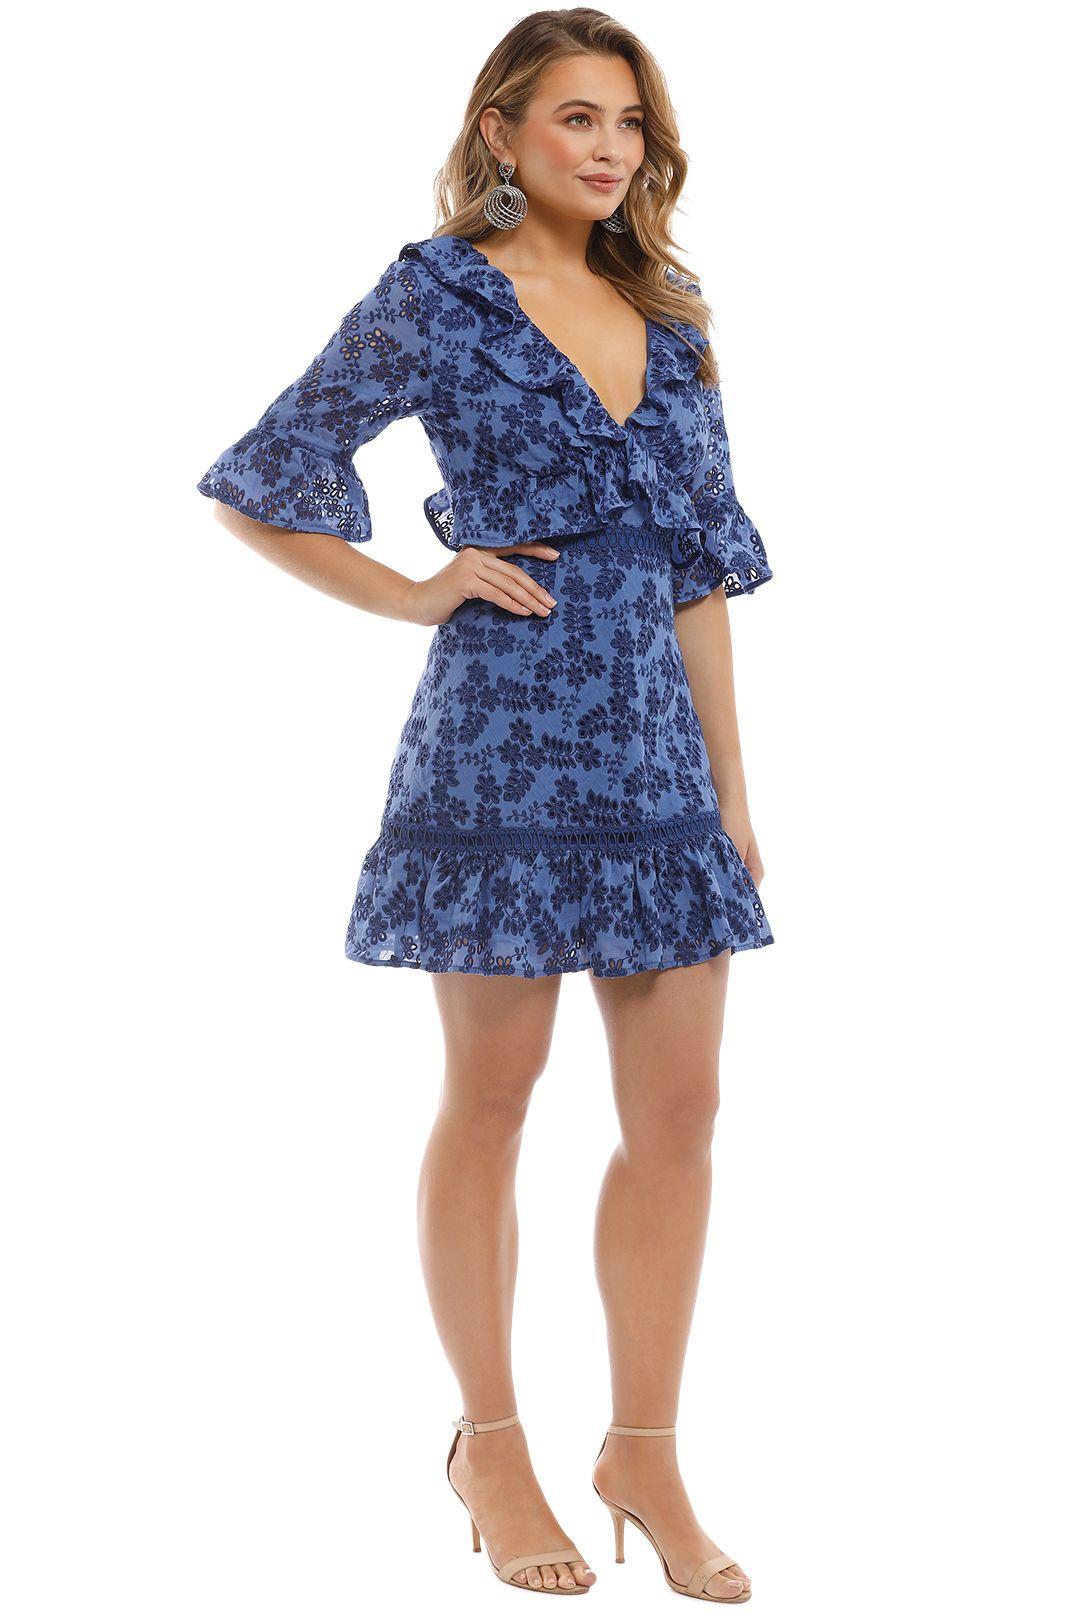 Talulah - Luna Mini Dress - Blue - Side